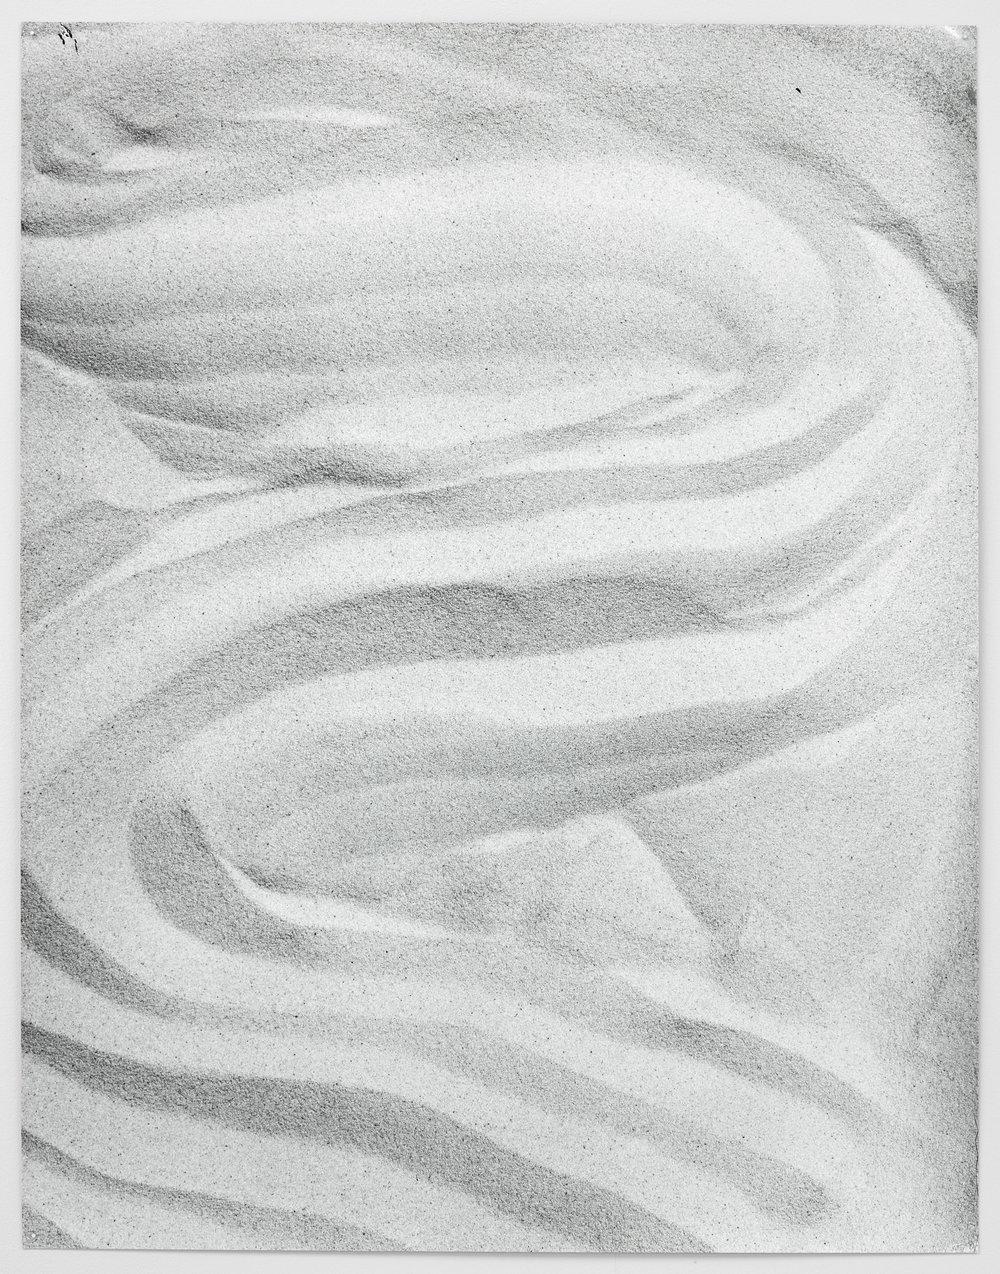 Dune Woman #11 (2017)